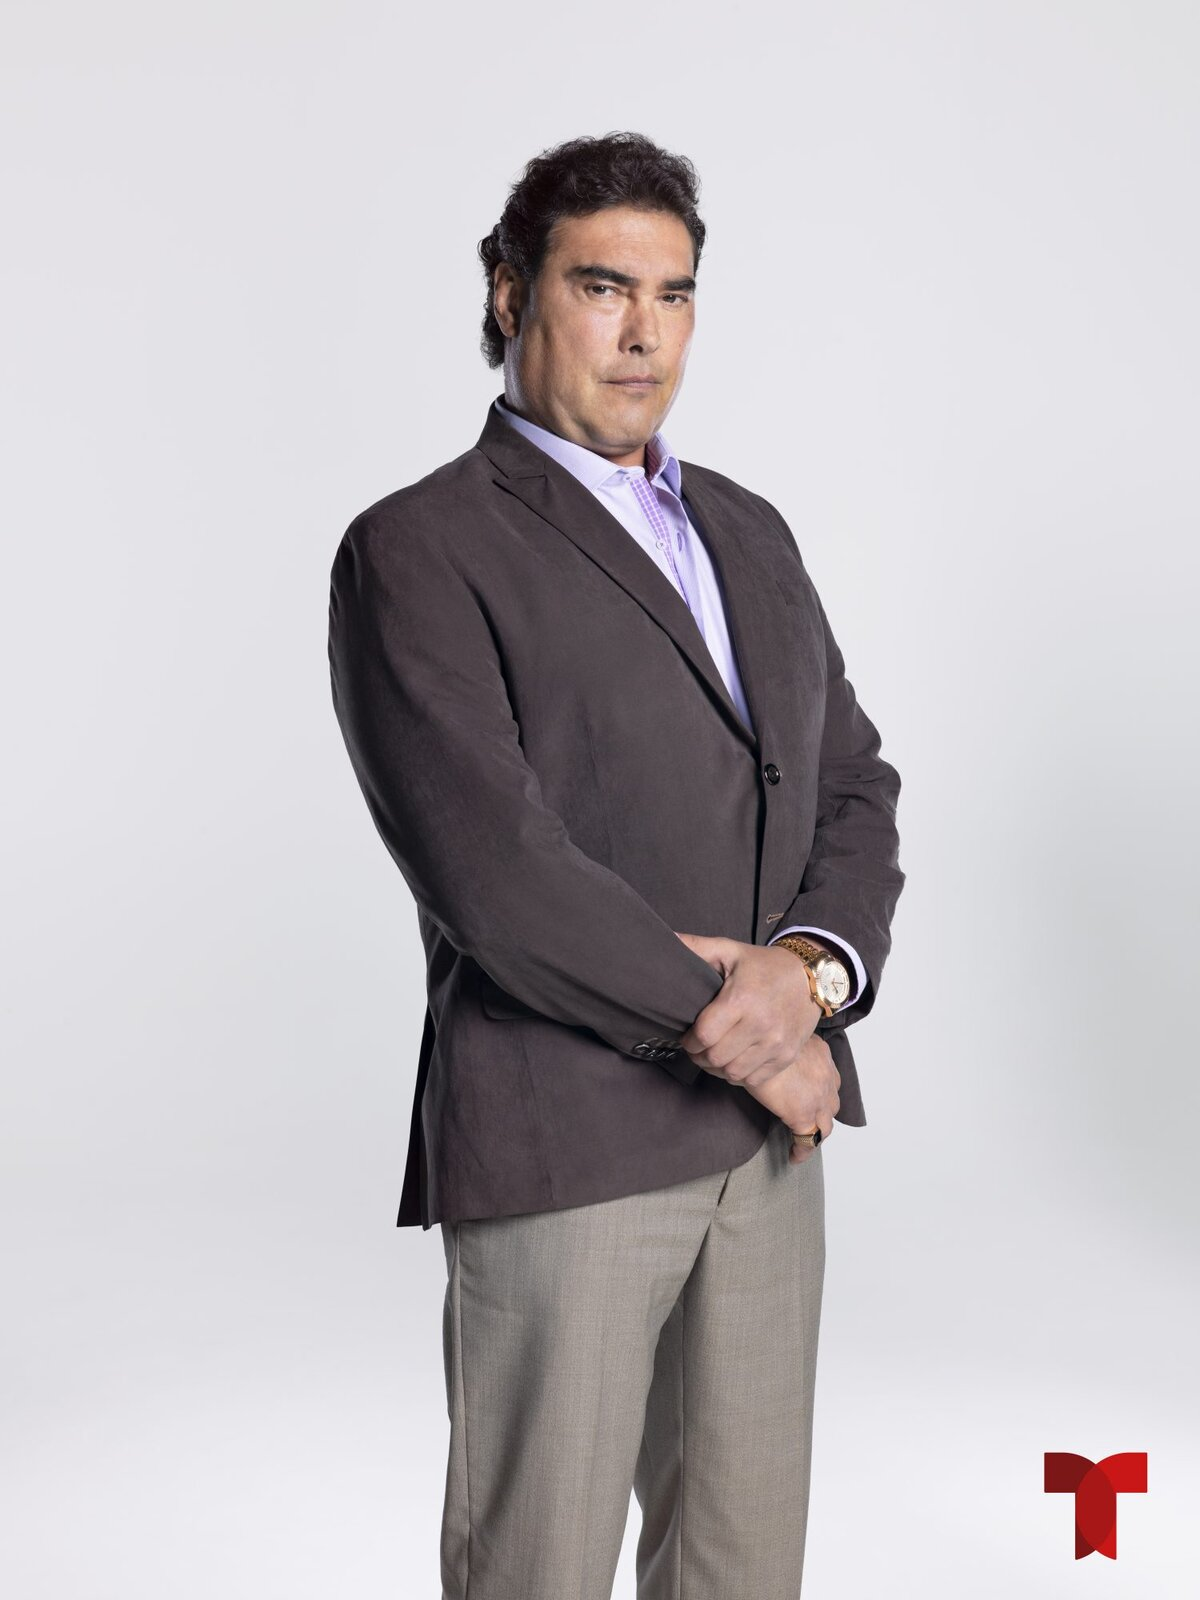 Mateo Corona- Eduardo Yáñez